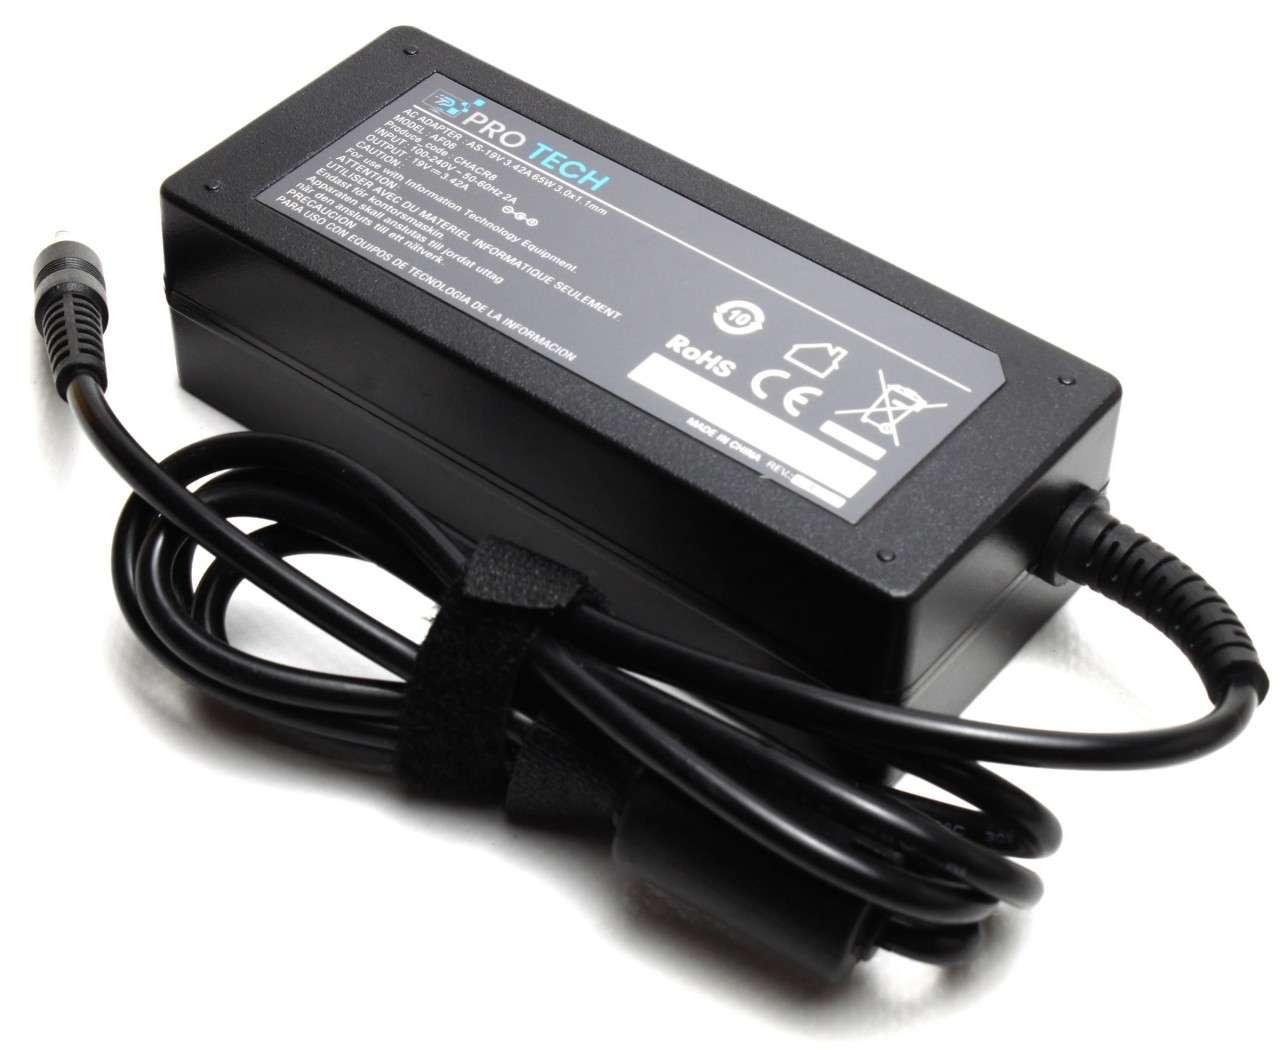 Incarcator Acer Aspire S7 191 6400 65W Replacement imagine powerlaptop.ro 2021